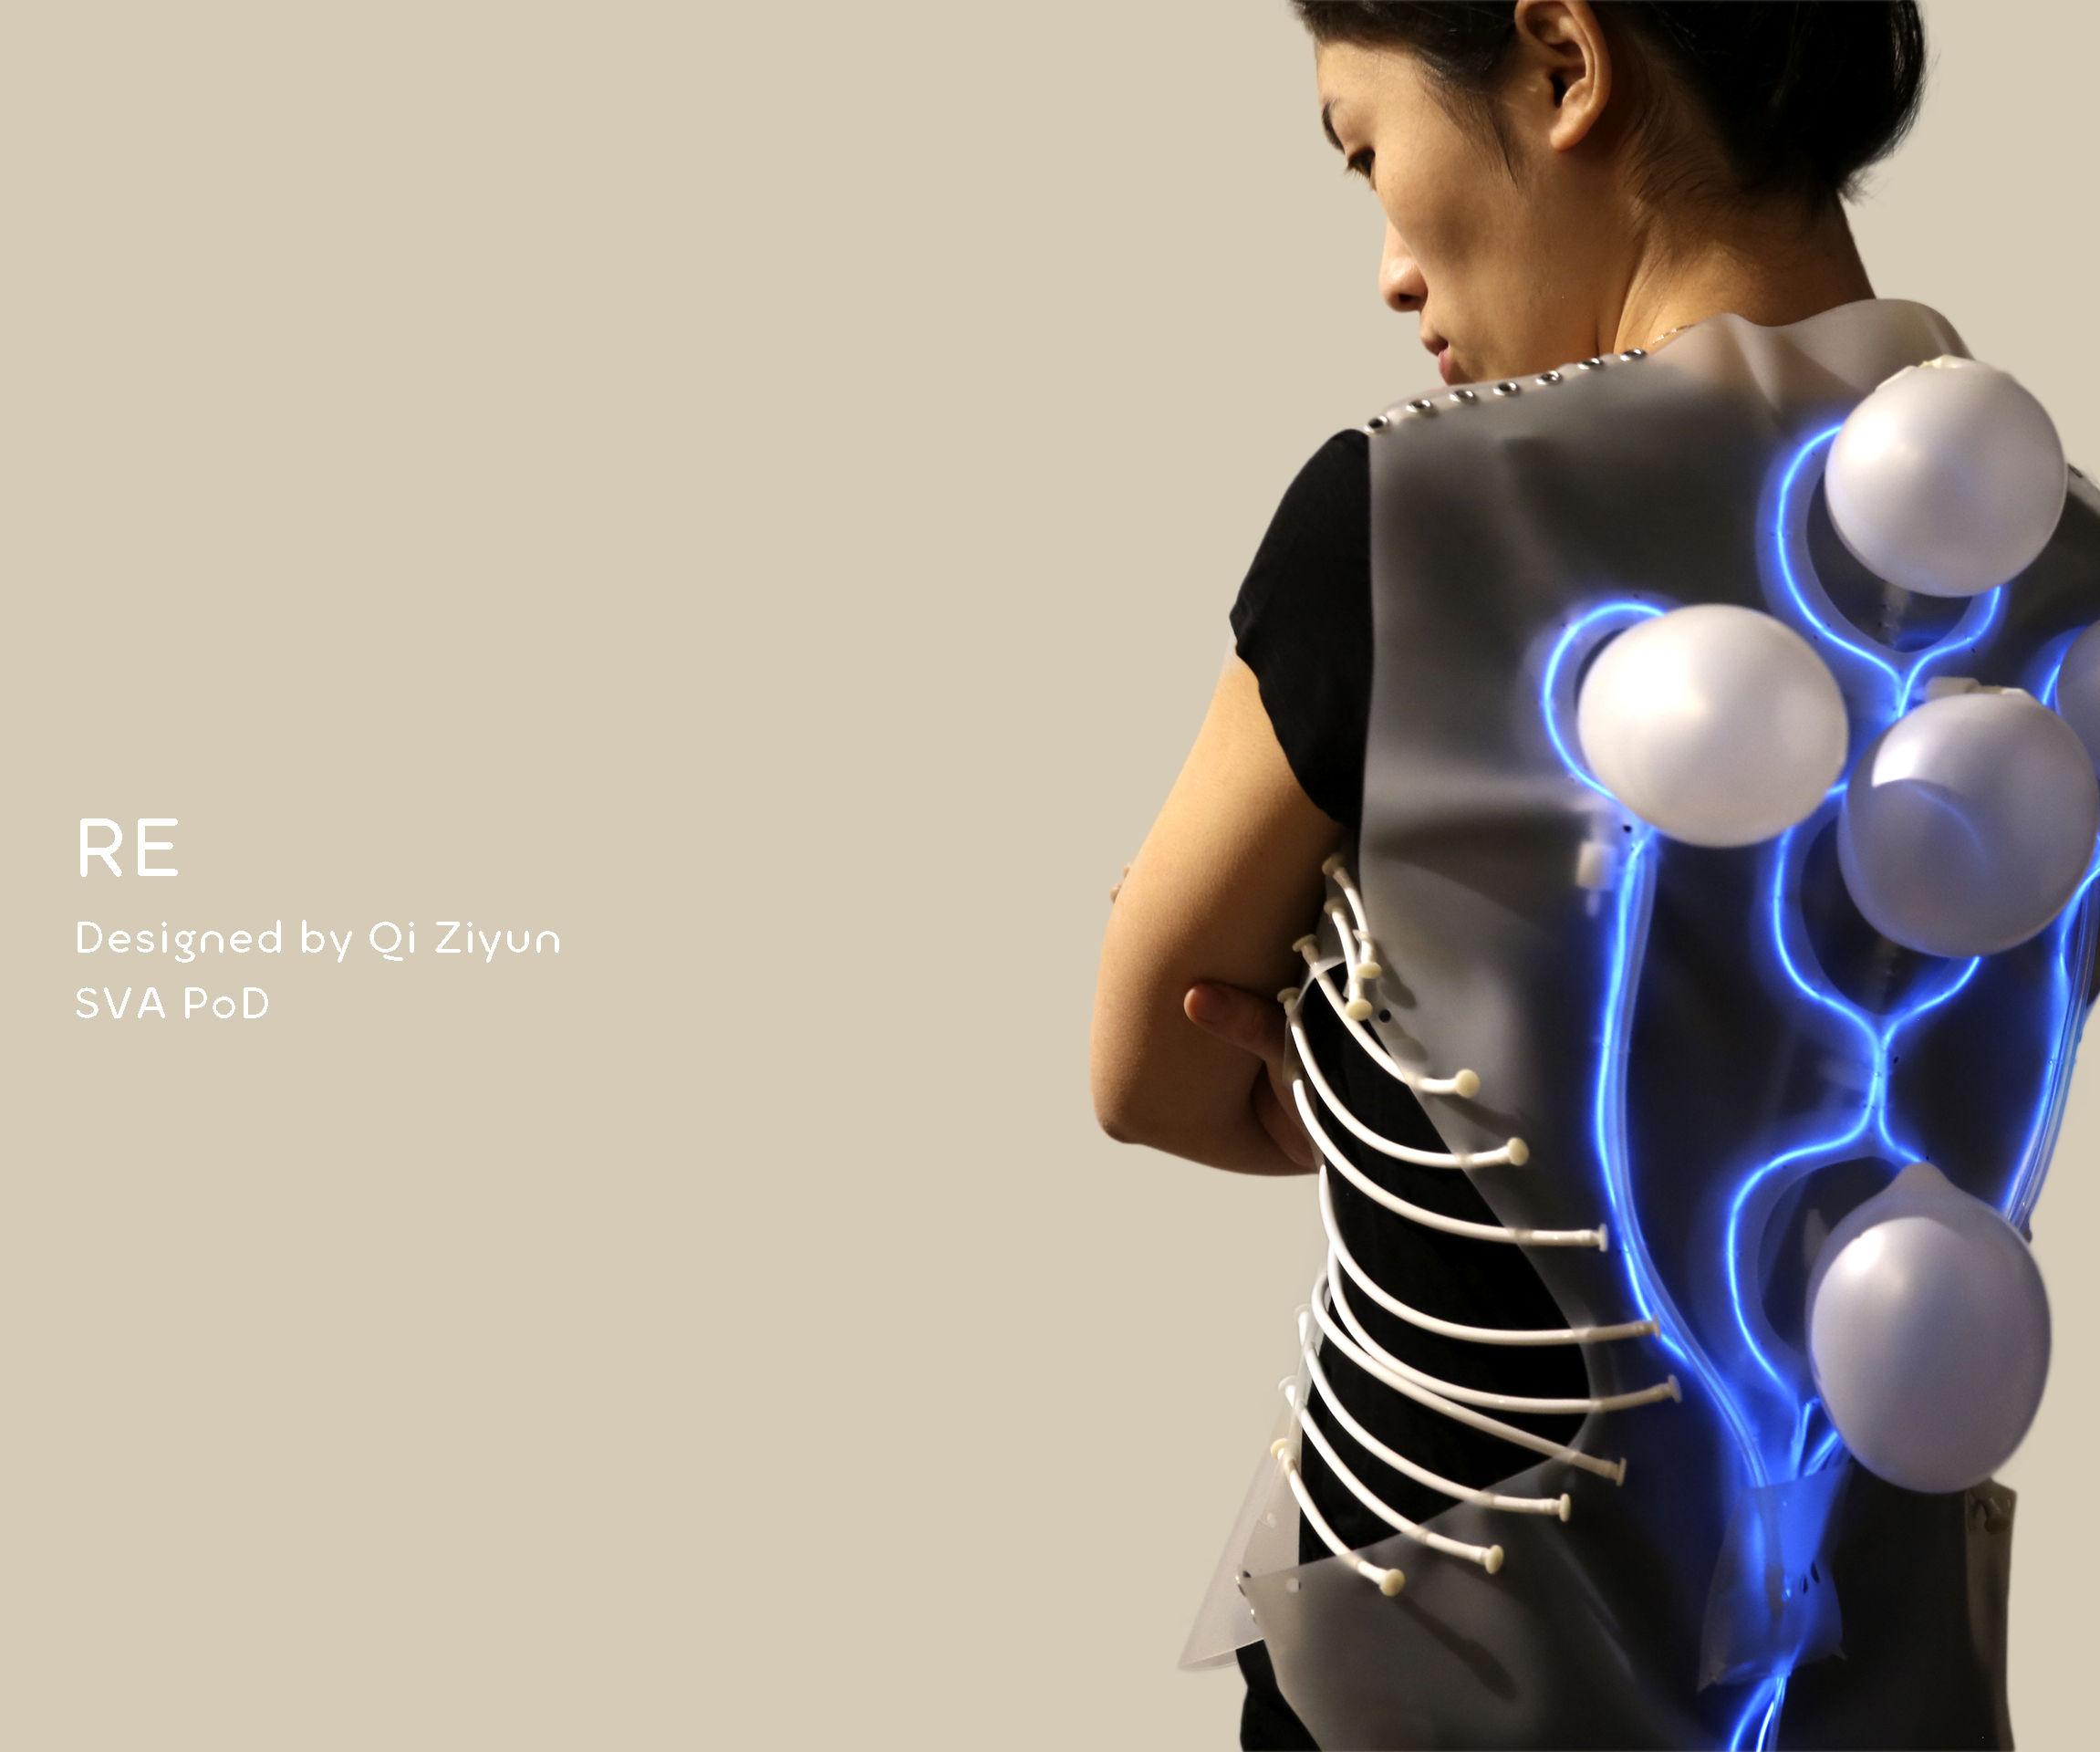 RE-Inflatable Vest